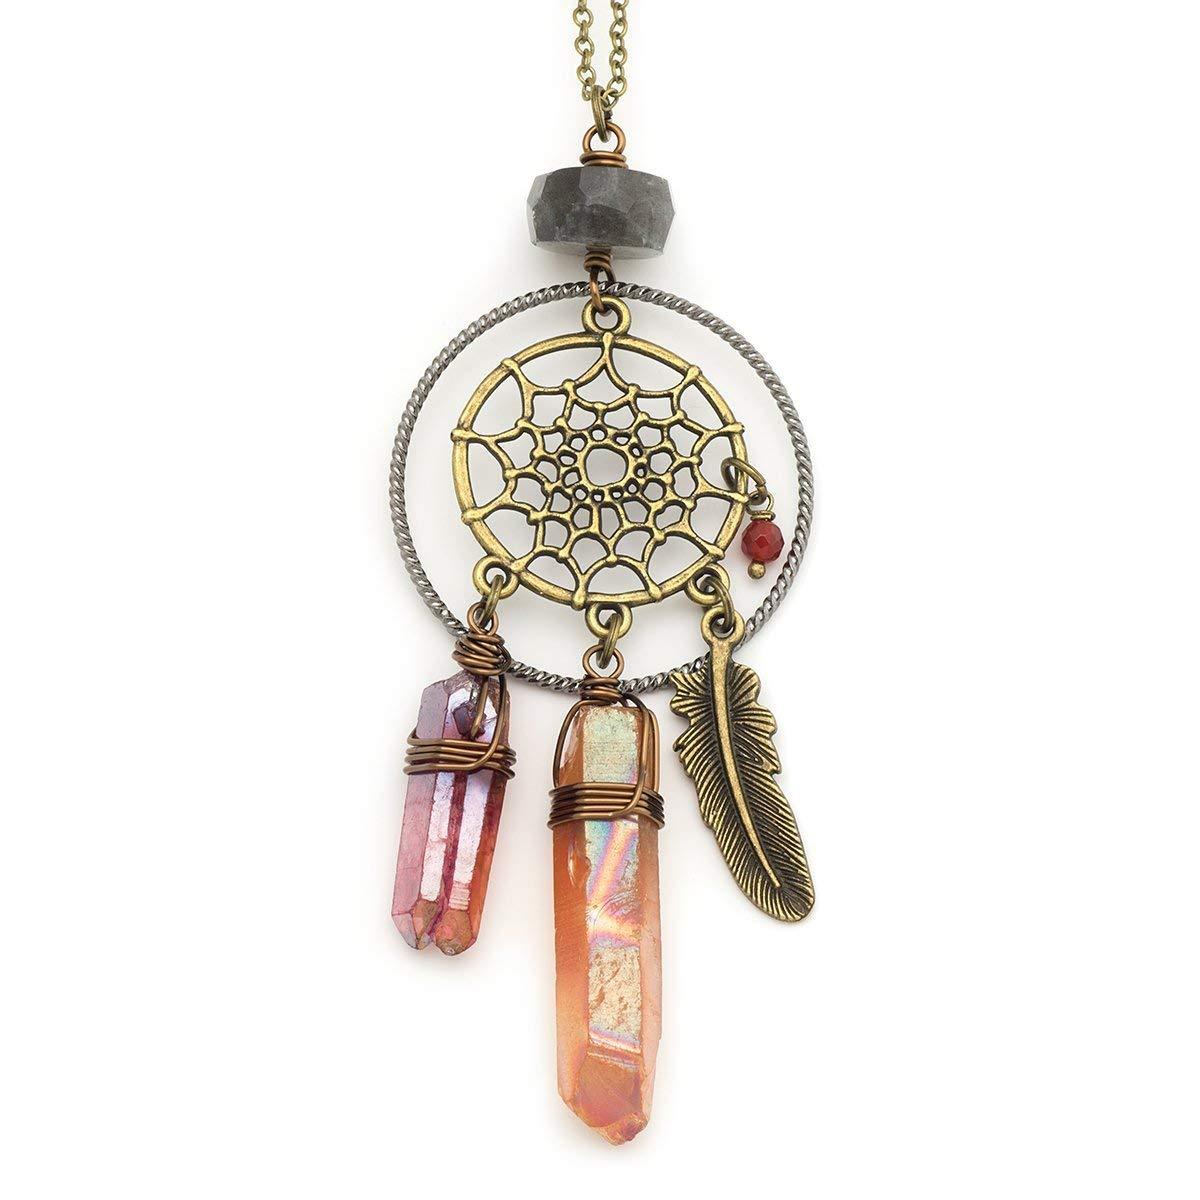 Dream catcher labradorite crystal aura quartz point bronze pendant necklace 22 in